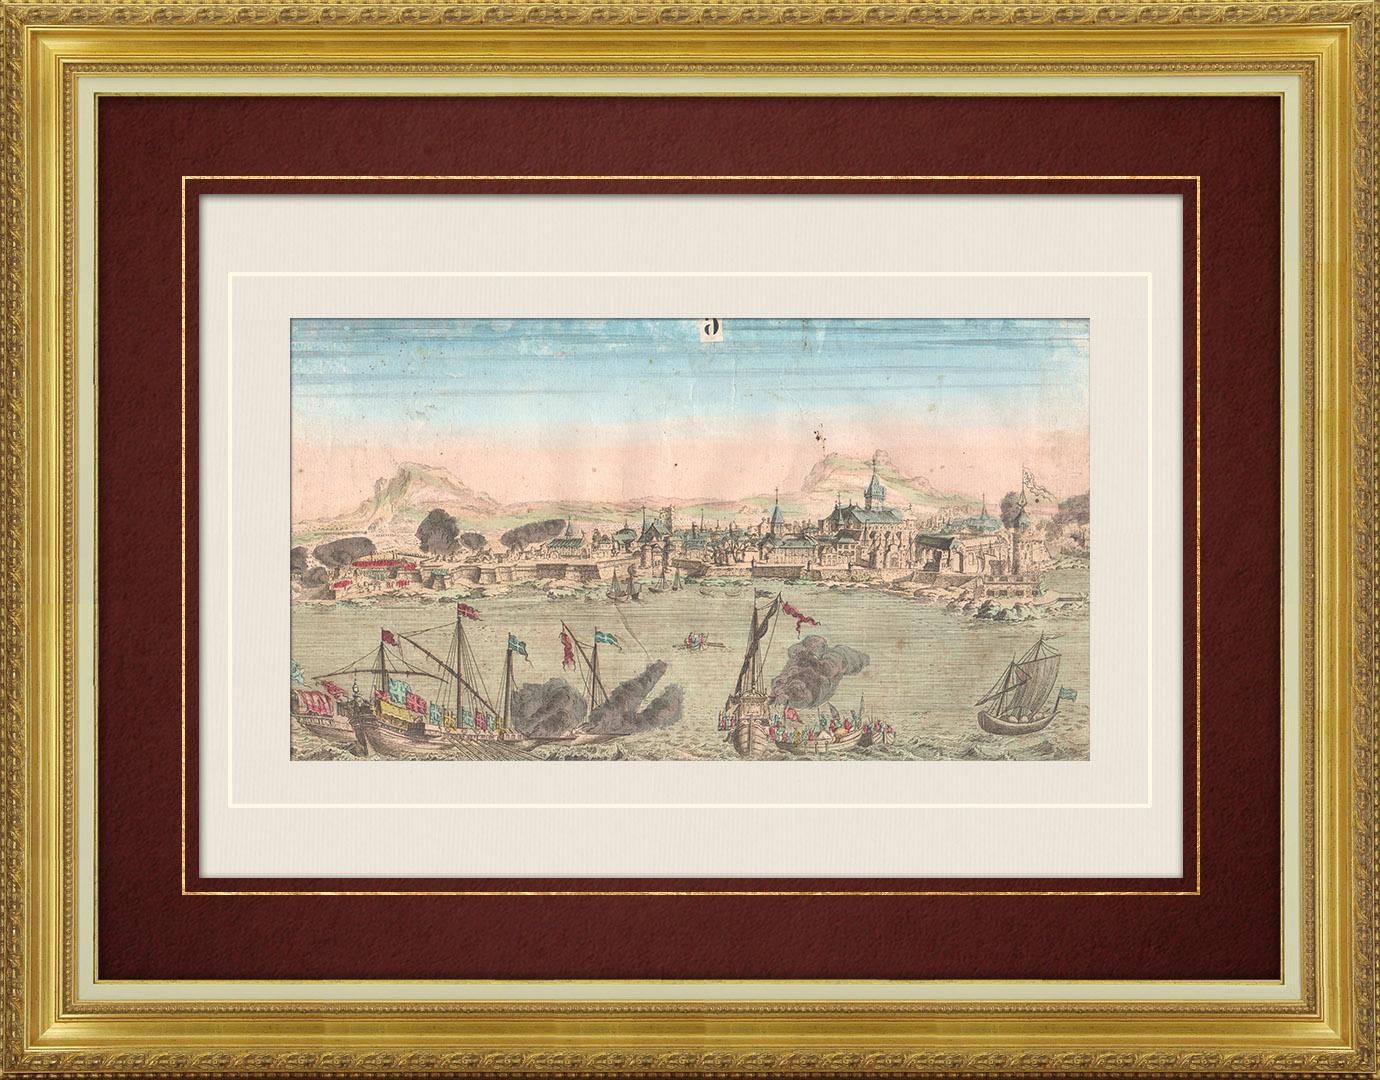 18th Century optical view in original watercolors of Iraklion Island - Crete (Greece)